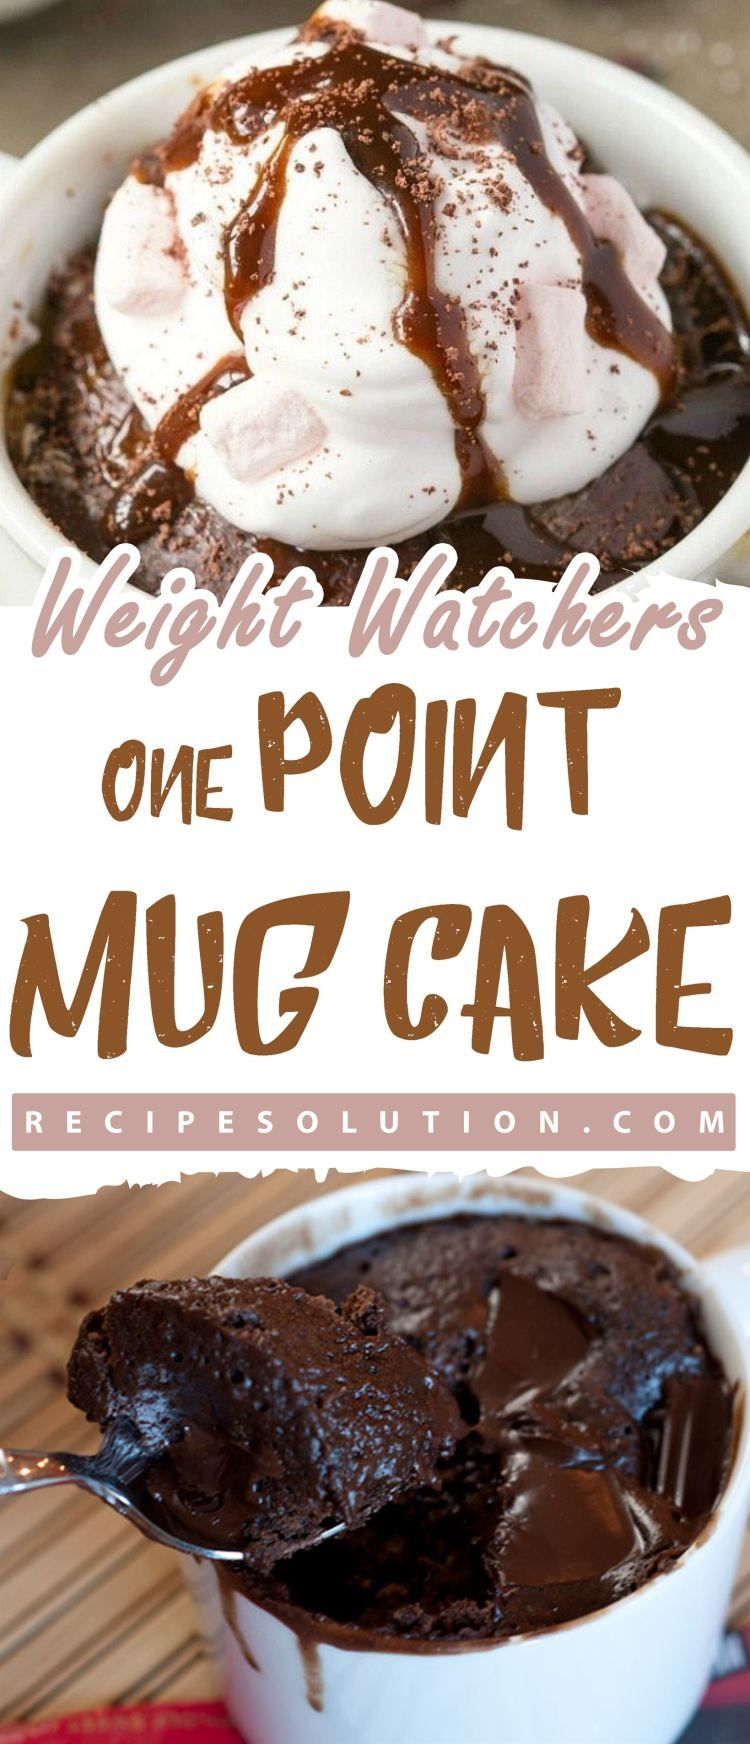 WEIGHT WATCHERS ONE POINT MUG CAKE - Recipe Solution ...